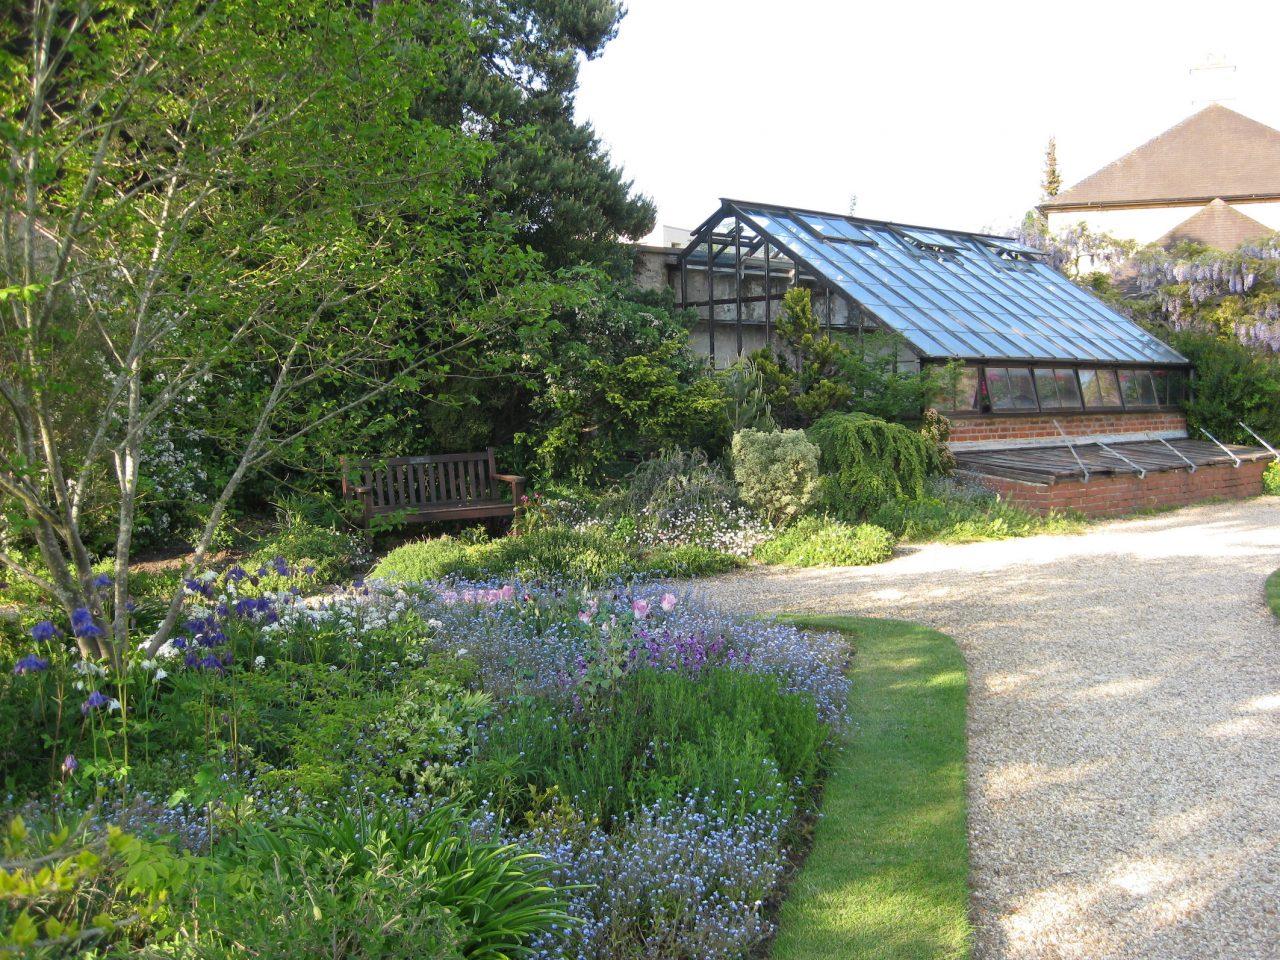 Greenhouse across gardens